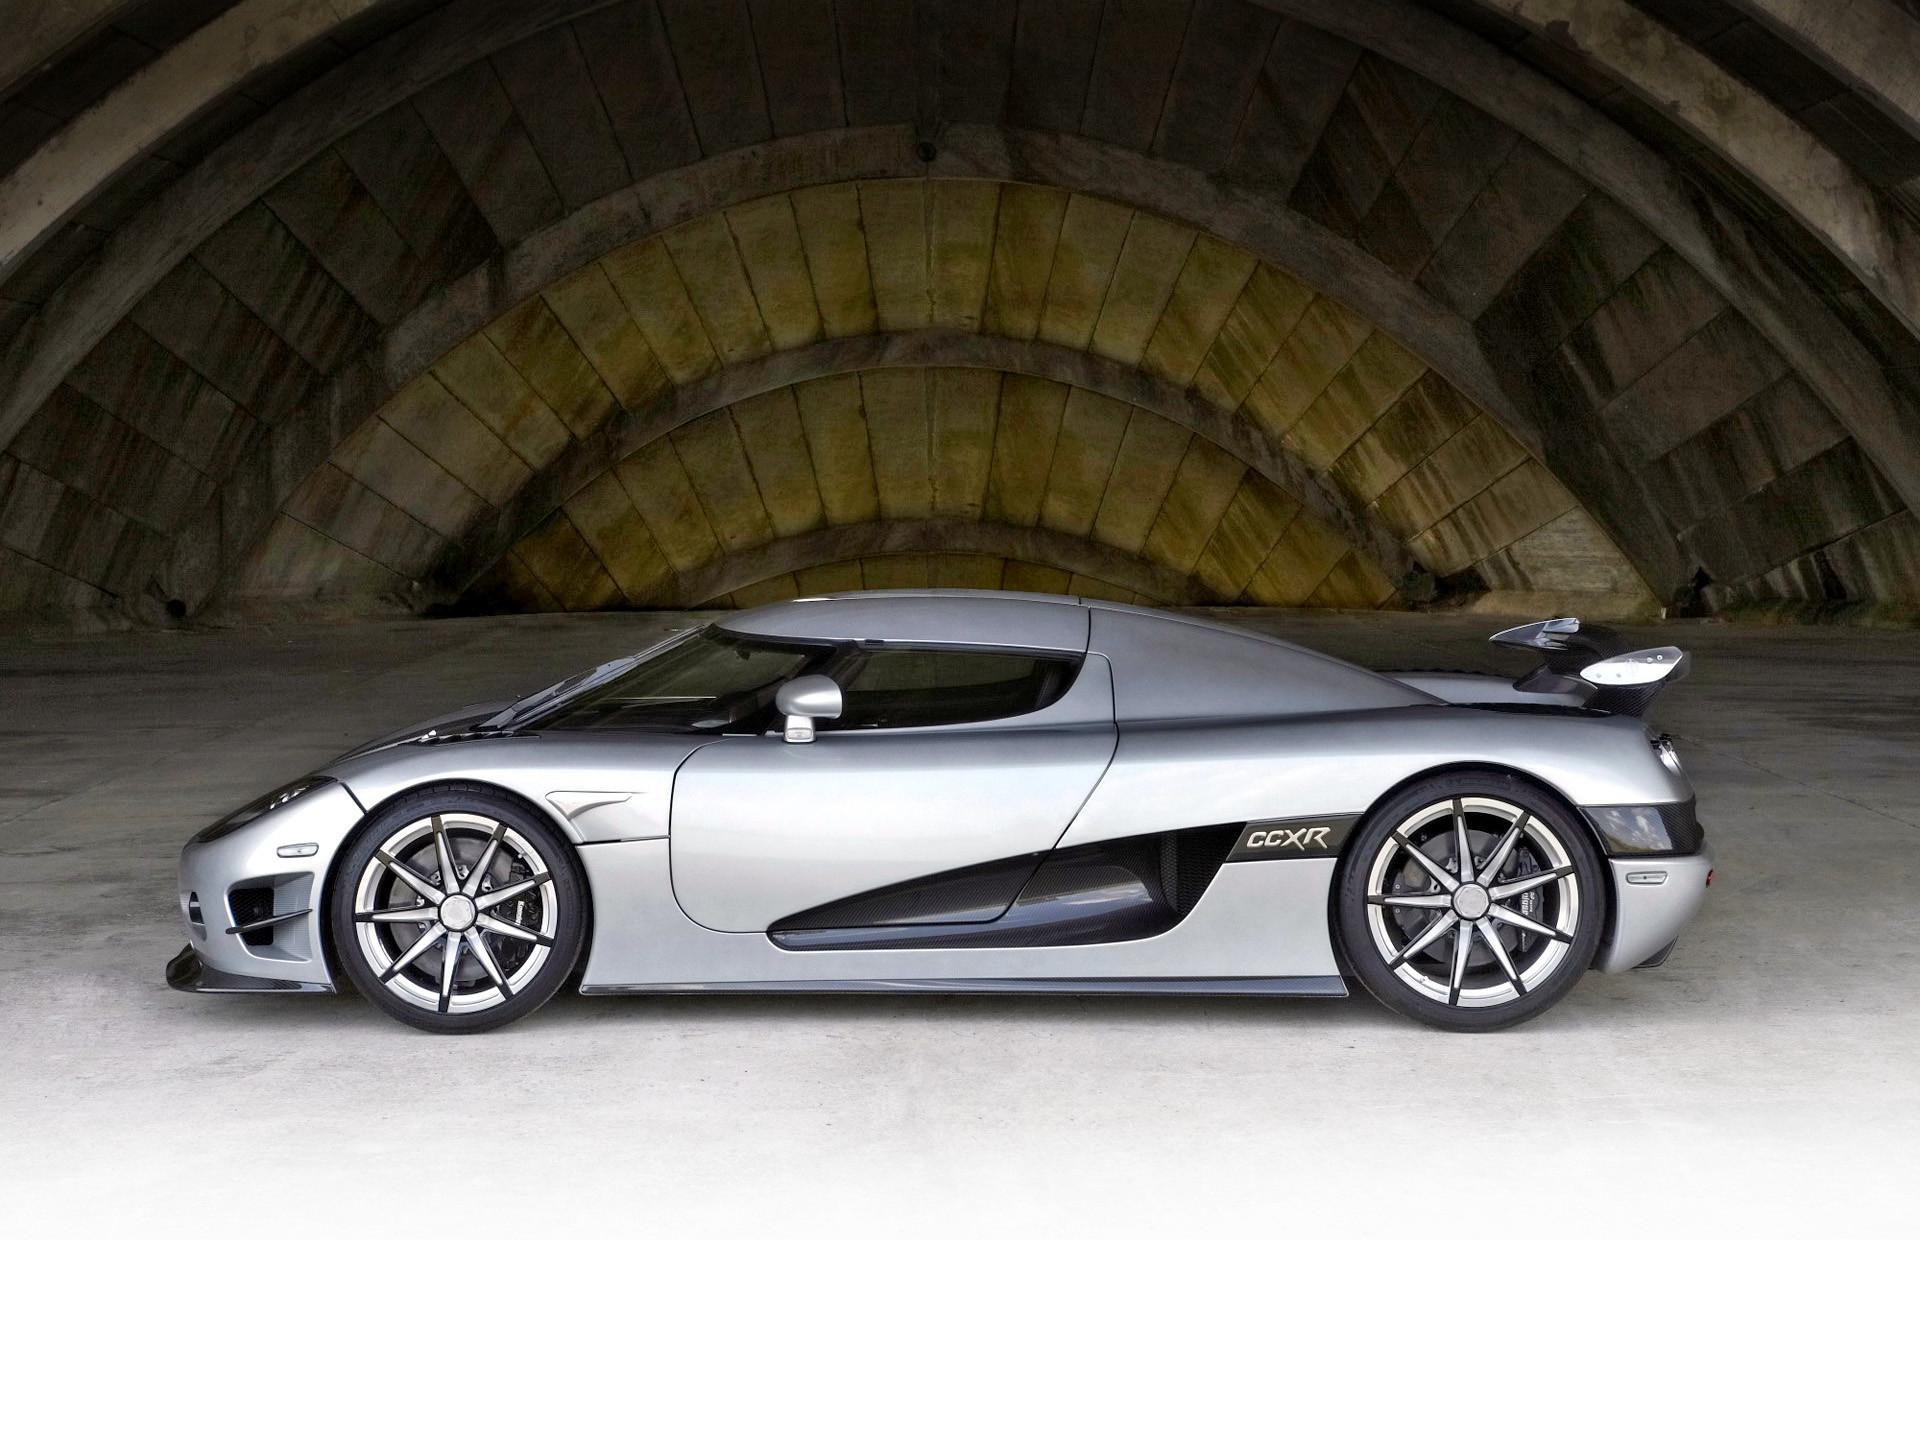 Koenigsegg Ccxr Trevita >> Koenigsegg Ccxr Wallpaper (71+ images)